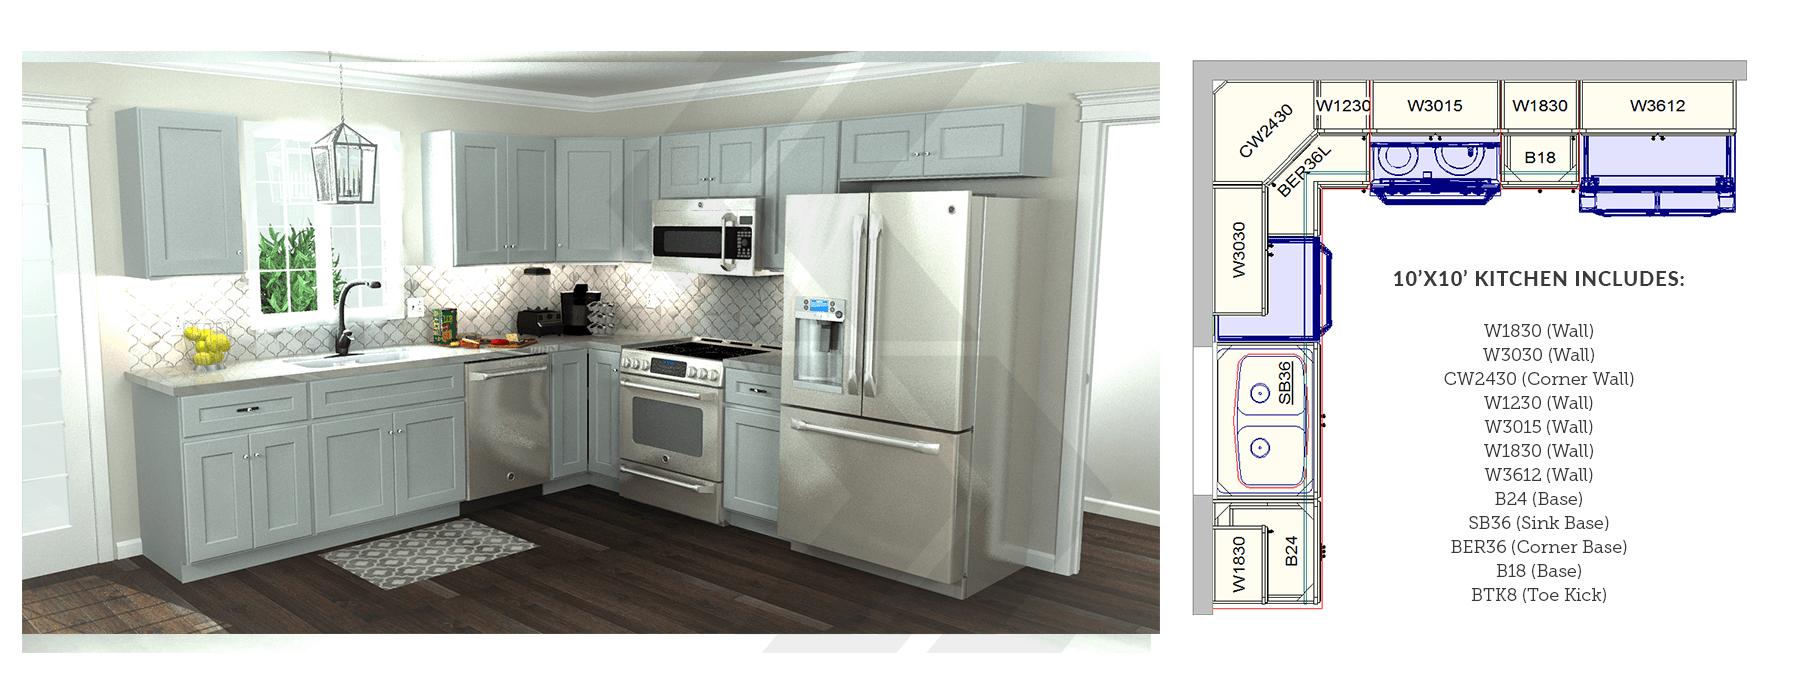 This Is A Typical 10 X 10 Kitchen With Diagram 10x10 Kitchen Kitchen Layout Kitchen Floor Plans